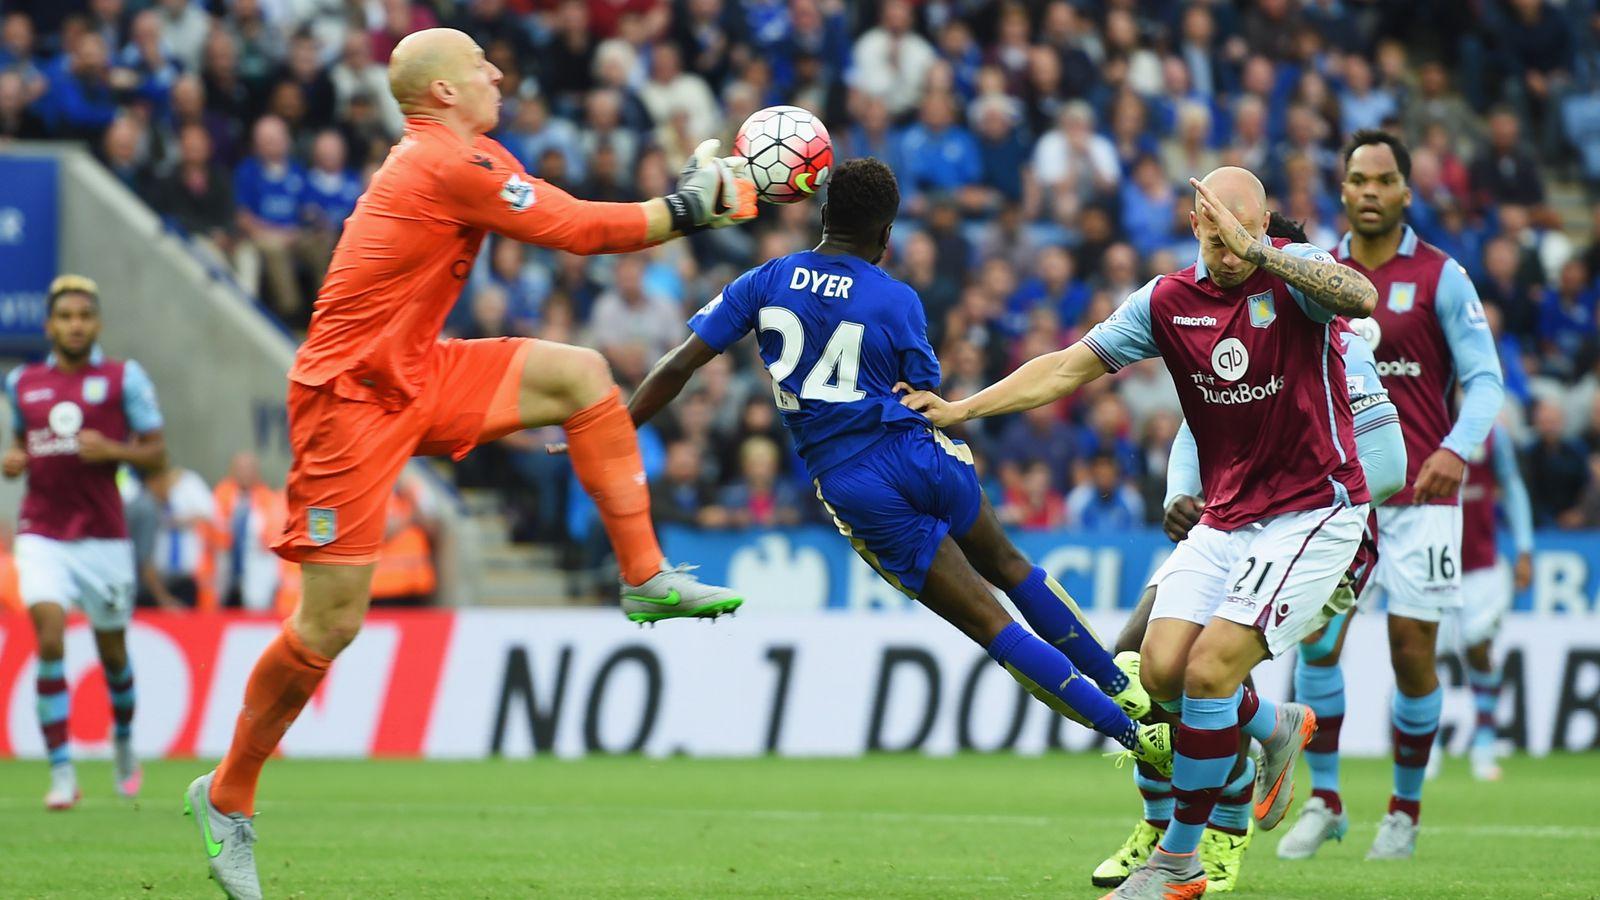 Aston Villa vs Leicester City 2016: News, Highlights ...